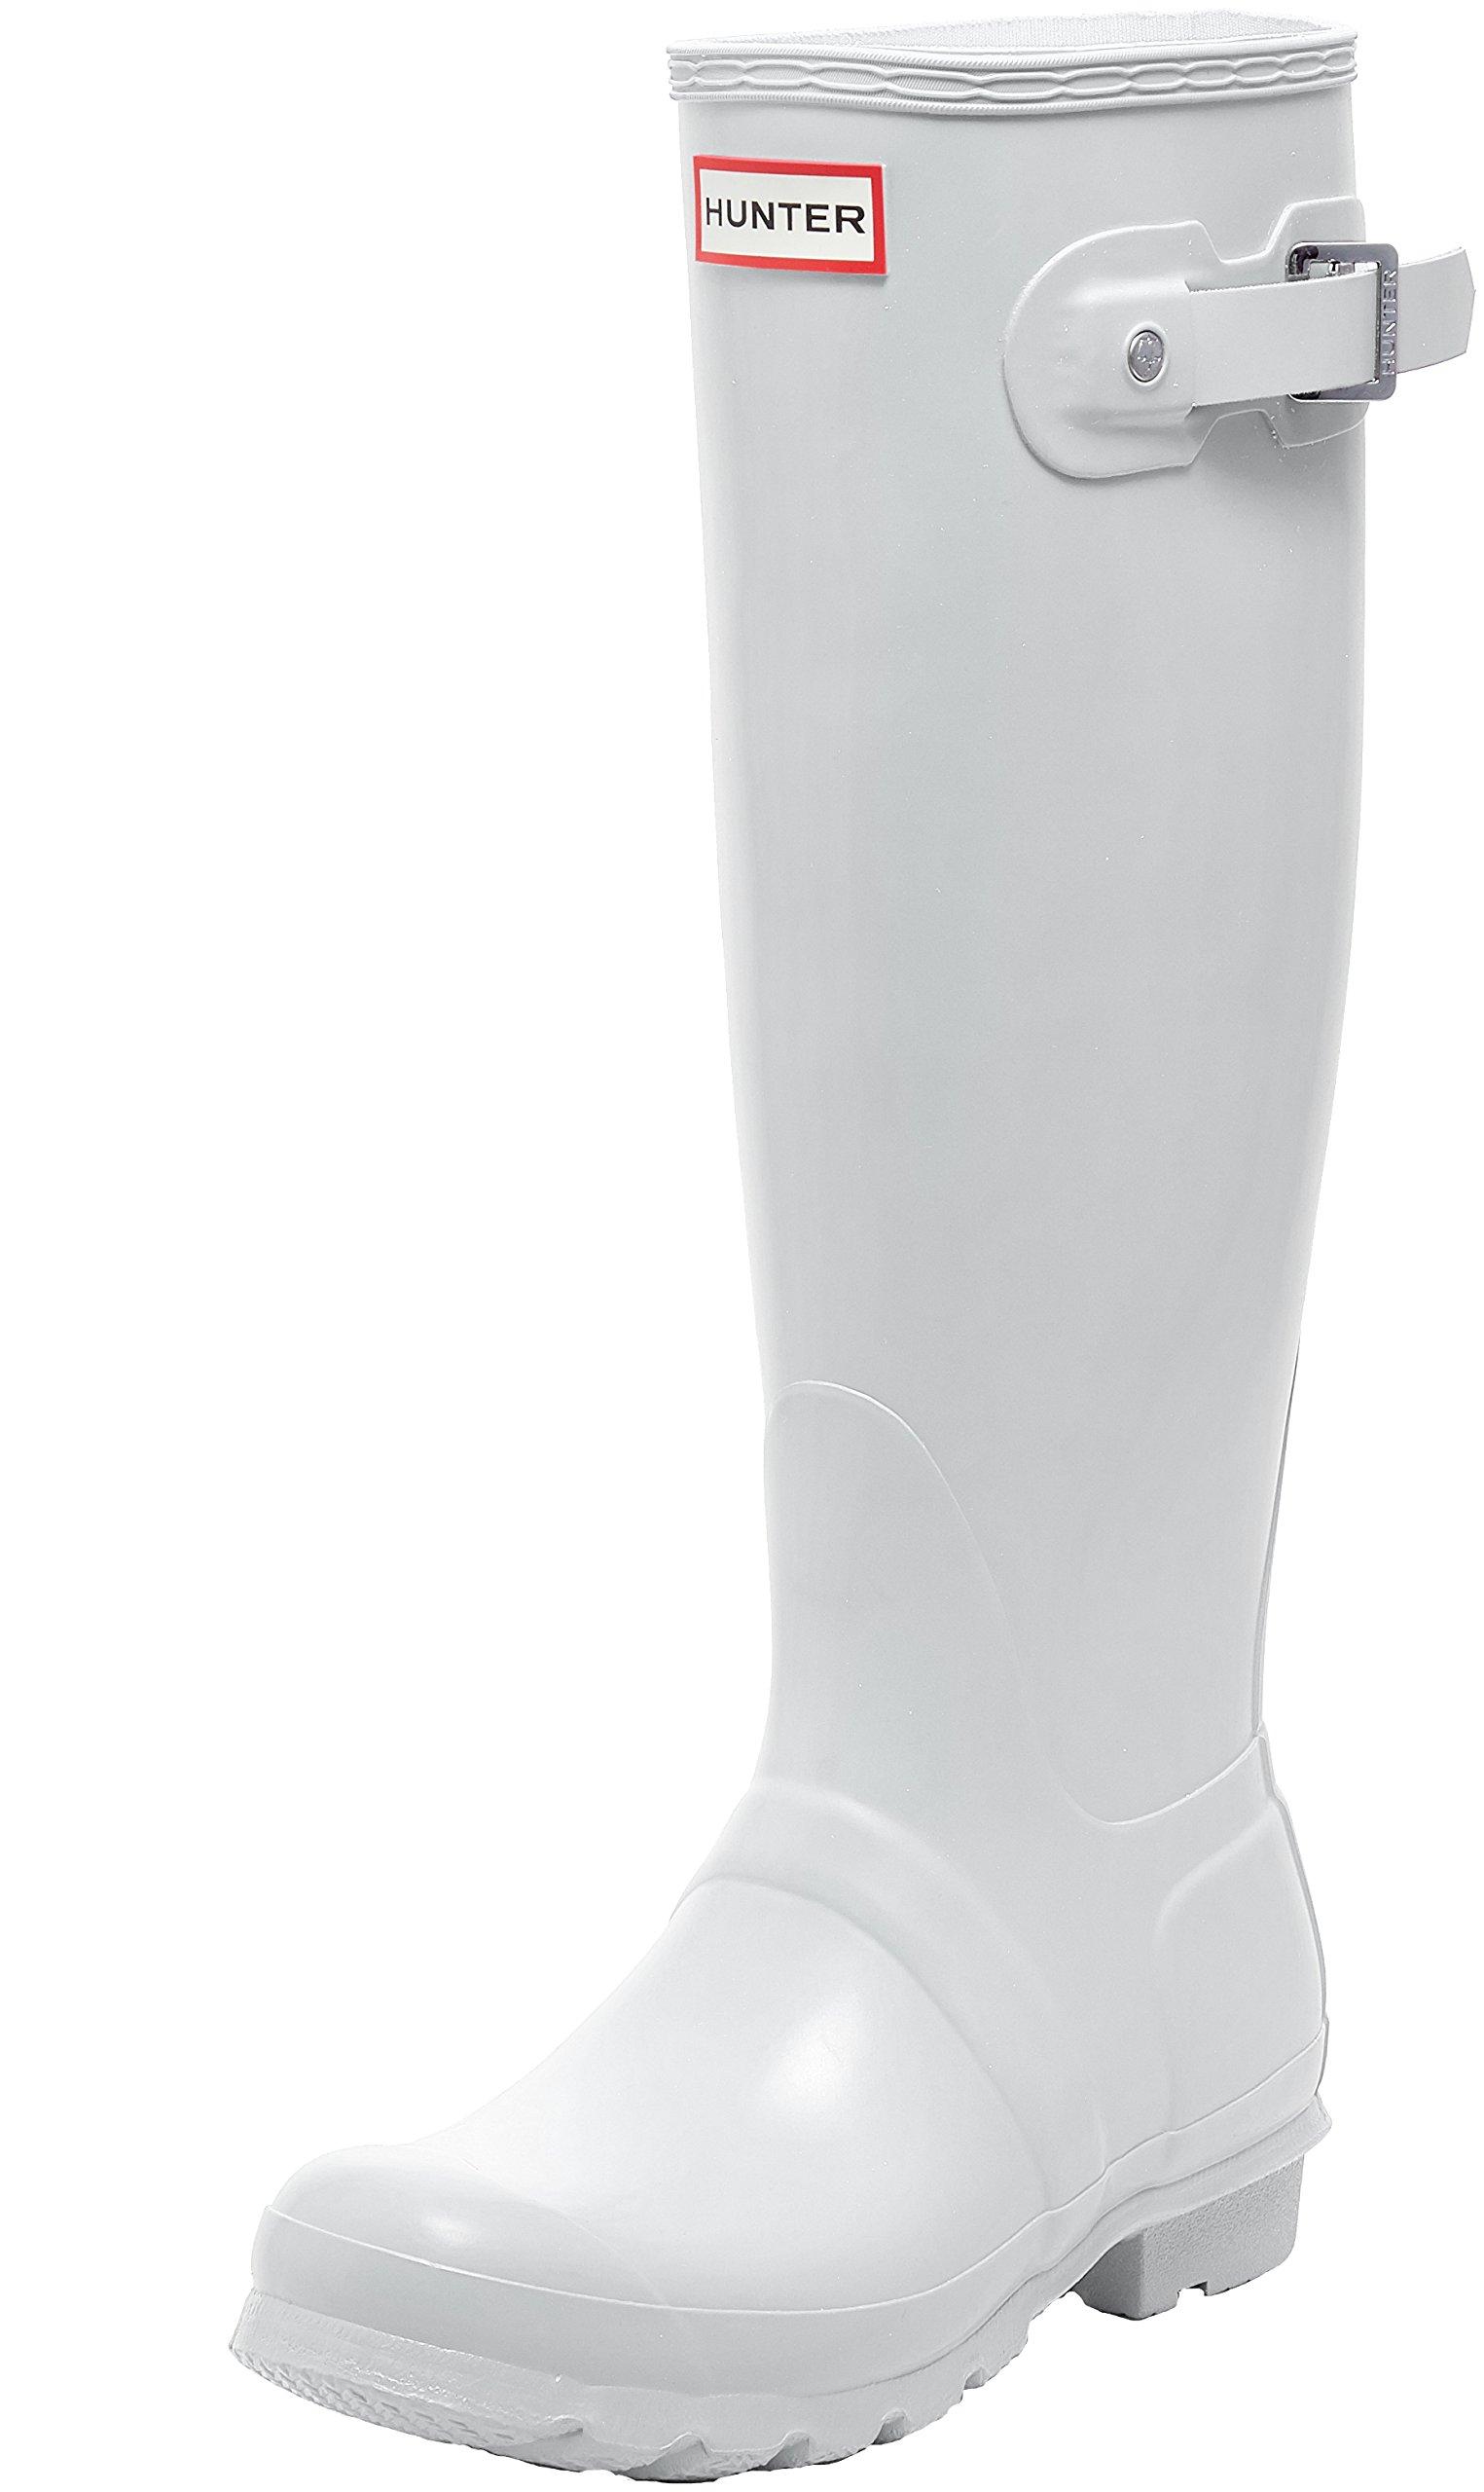 Hunter Women's Original Tall White Rain Boots - 7 B(M) US